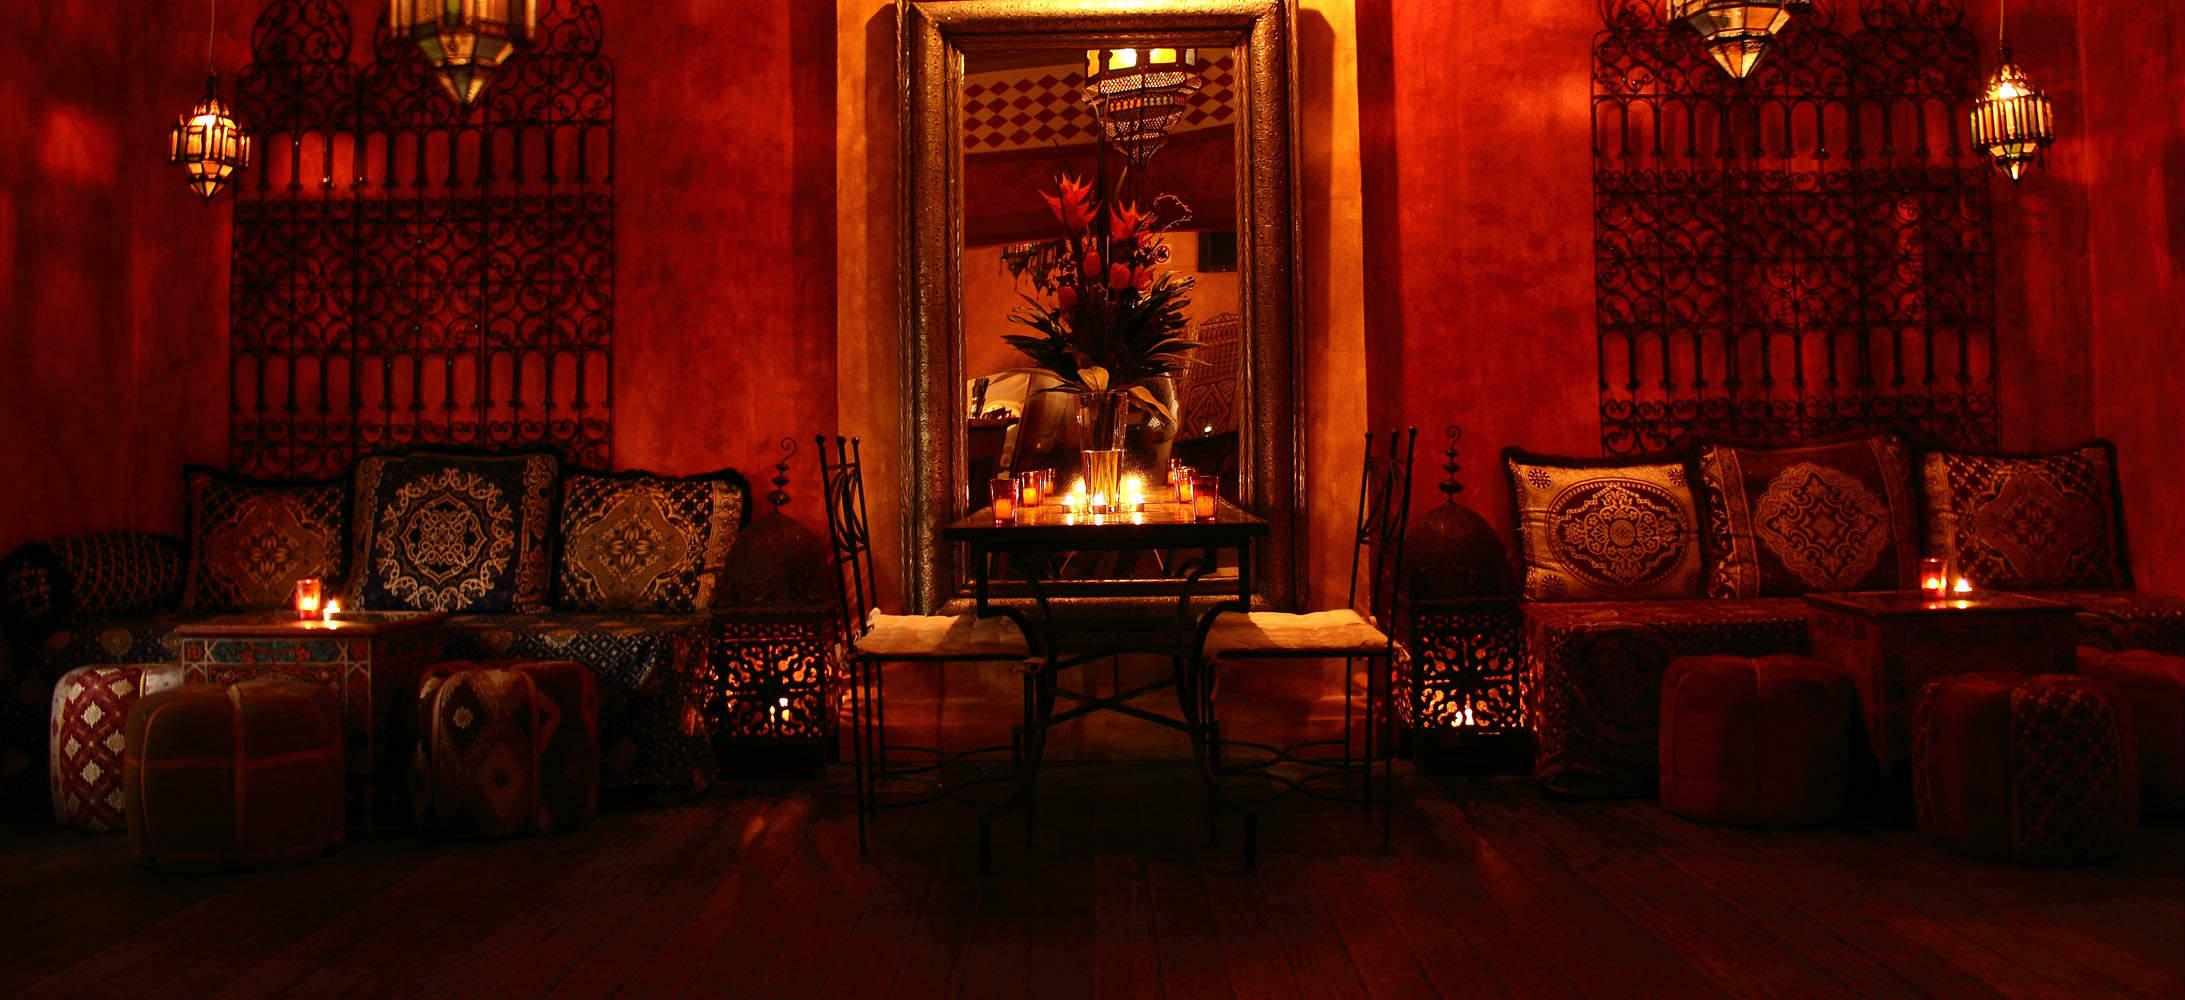 Morocco Lounge Engagement Party Venue Melbourne Mofo Lounge